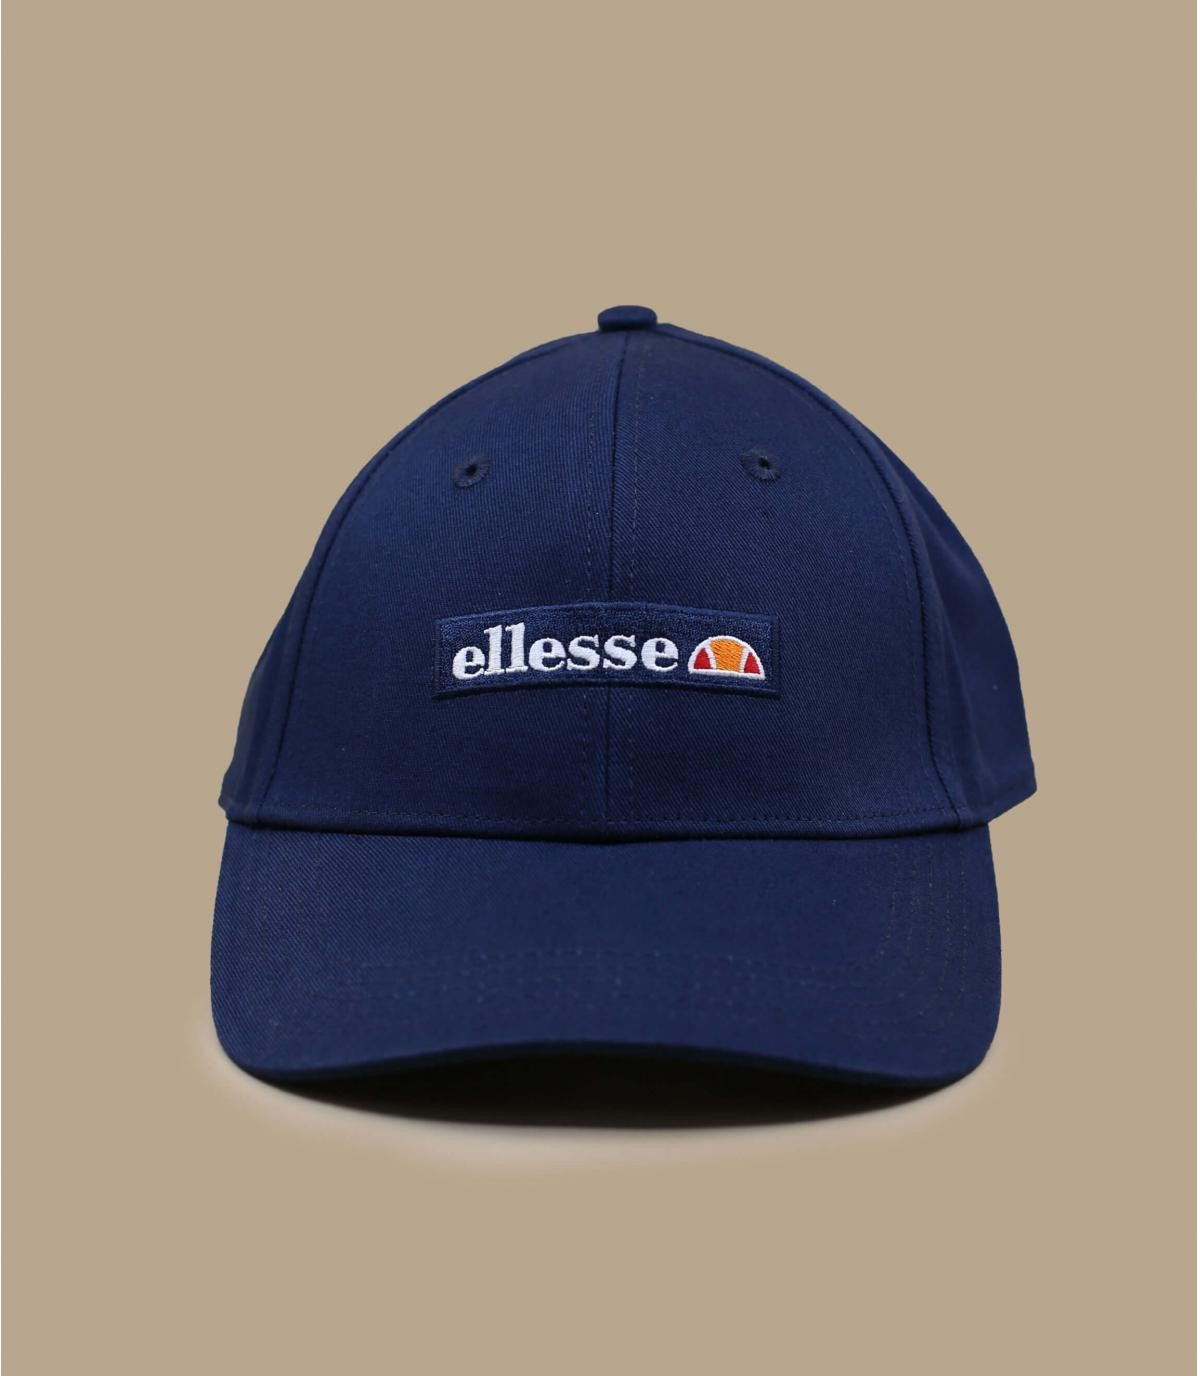 navy blue Ellesse cap